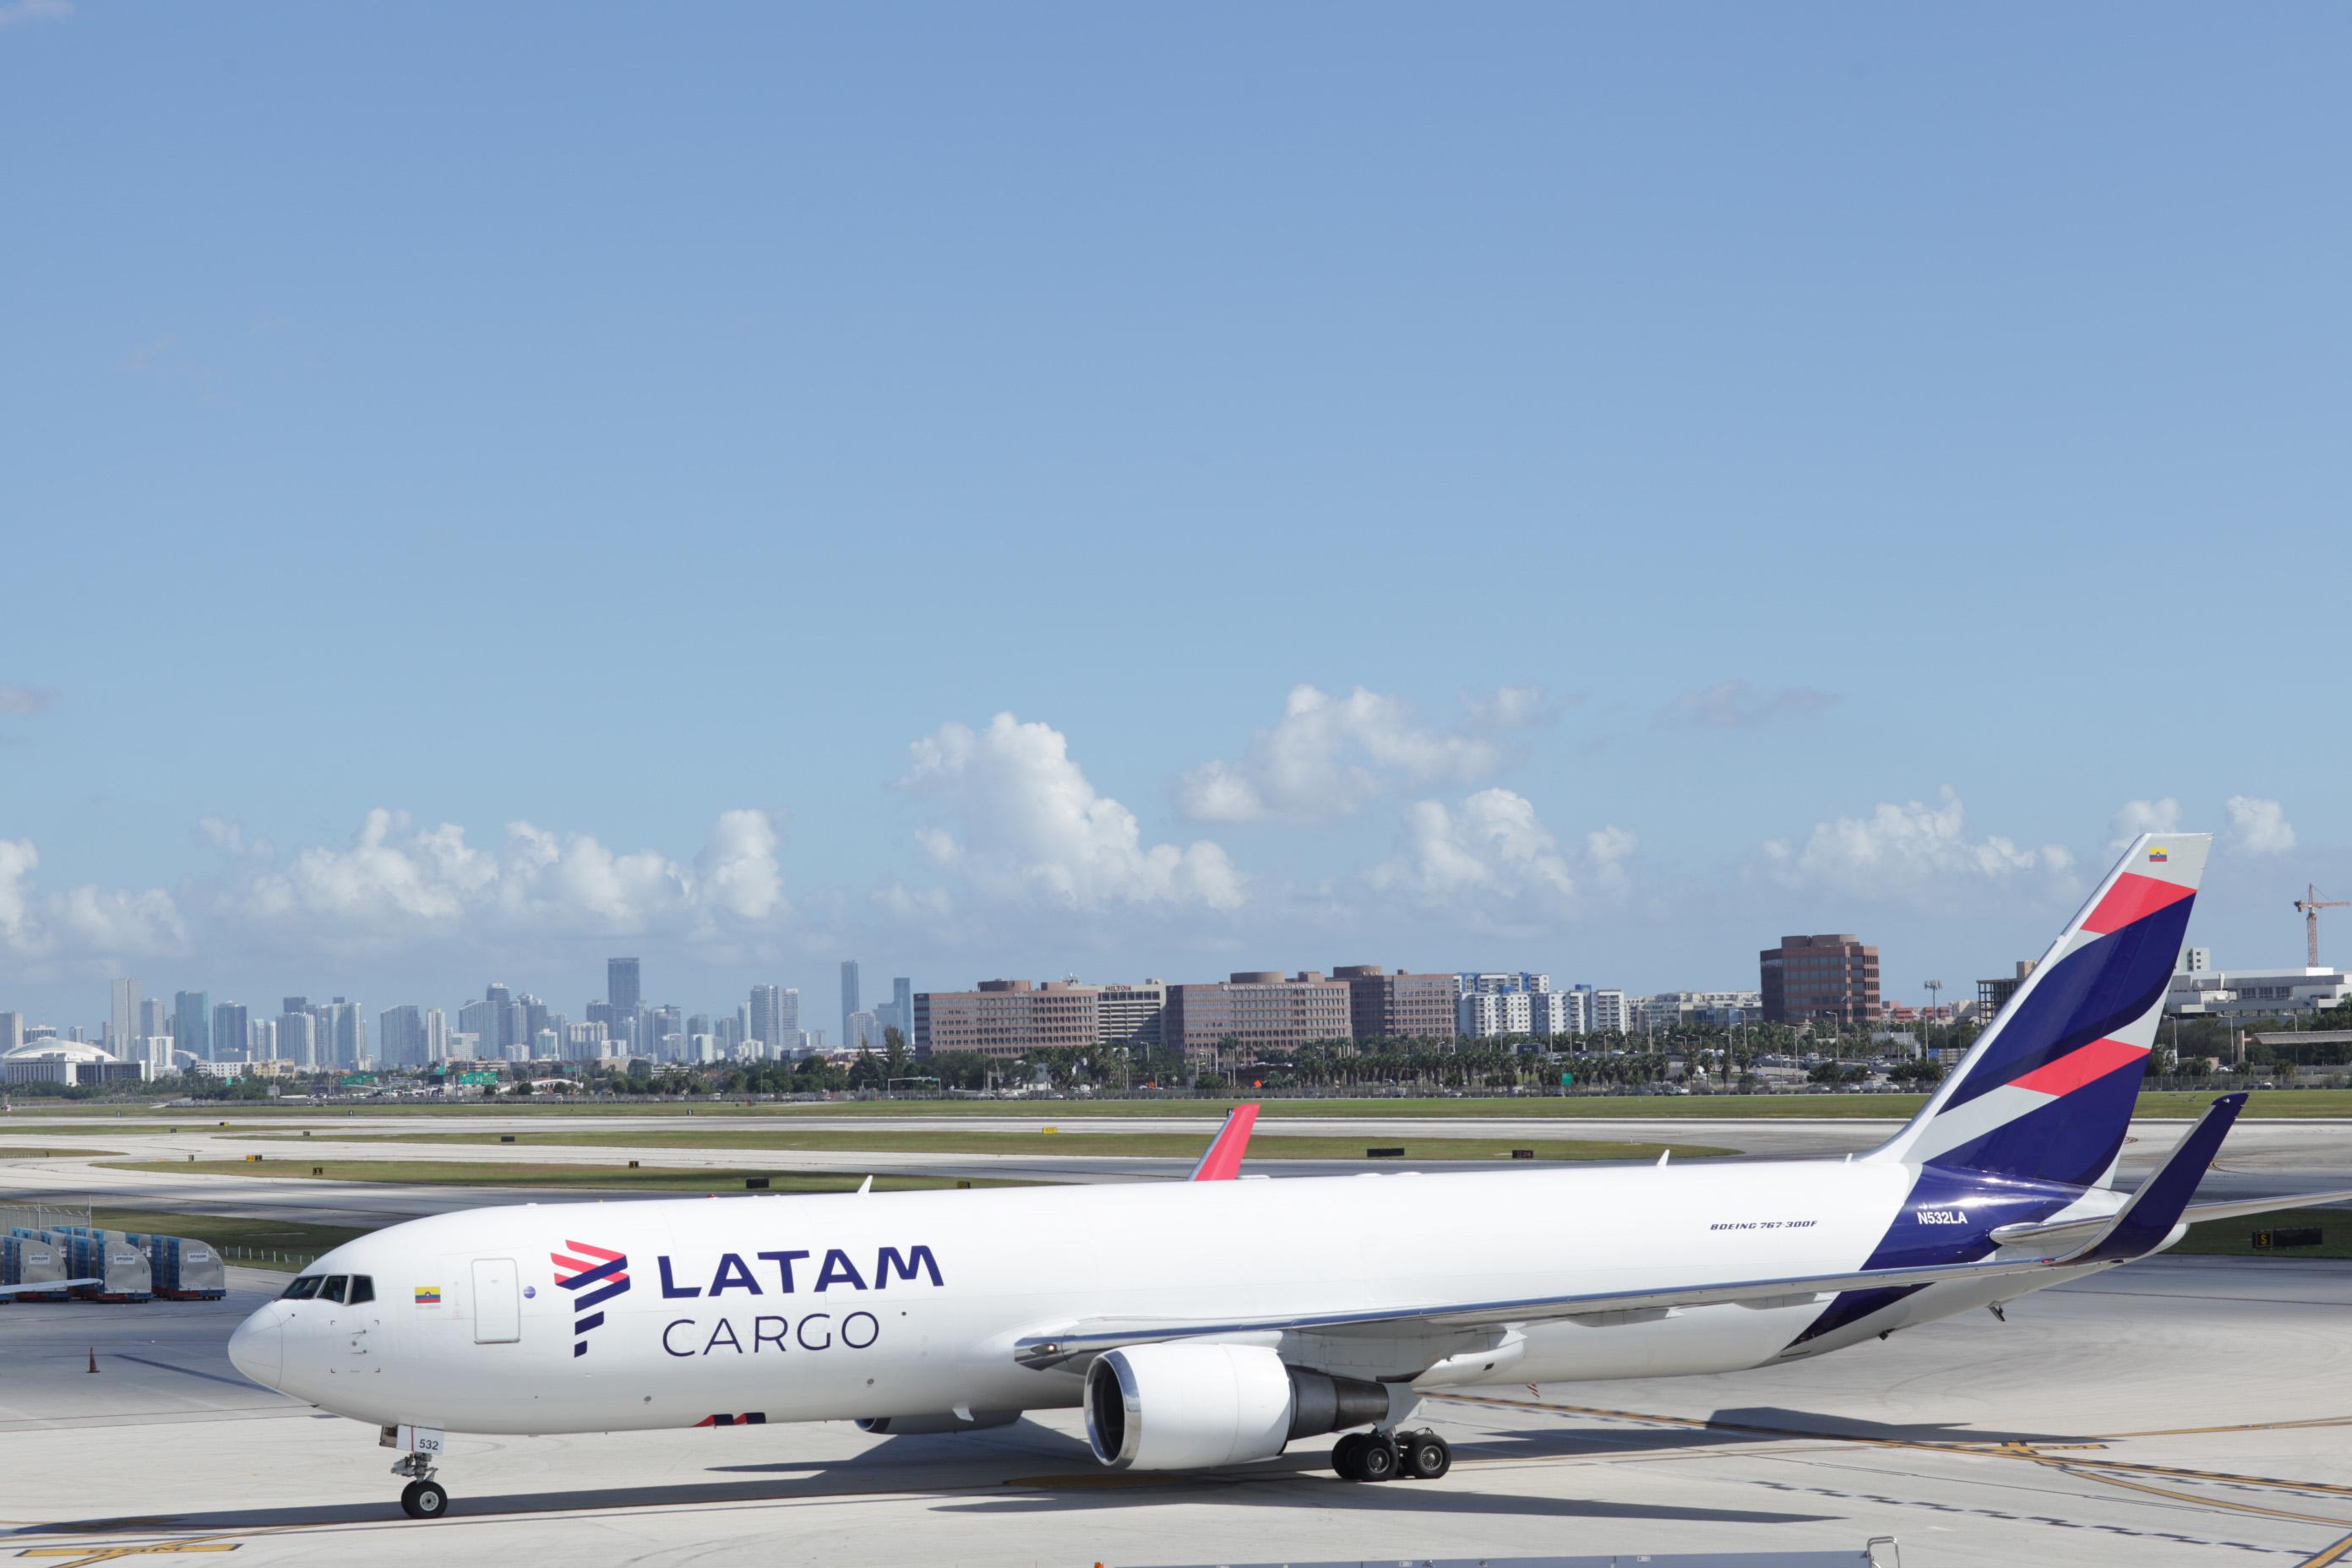 LATAM launches flight for Panalpina to its Huntsville air cargo gateway | Air Cargo World